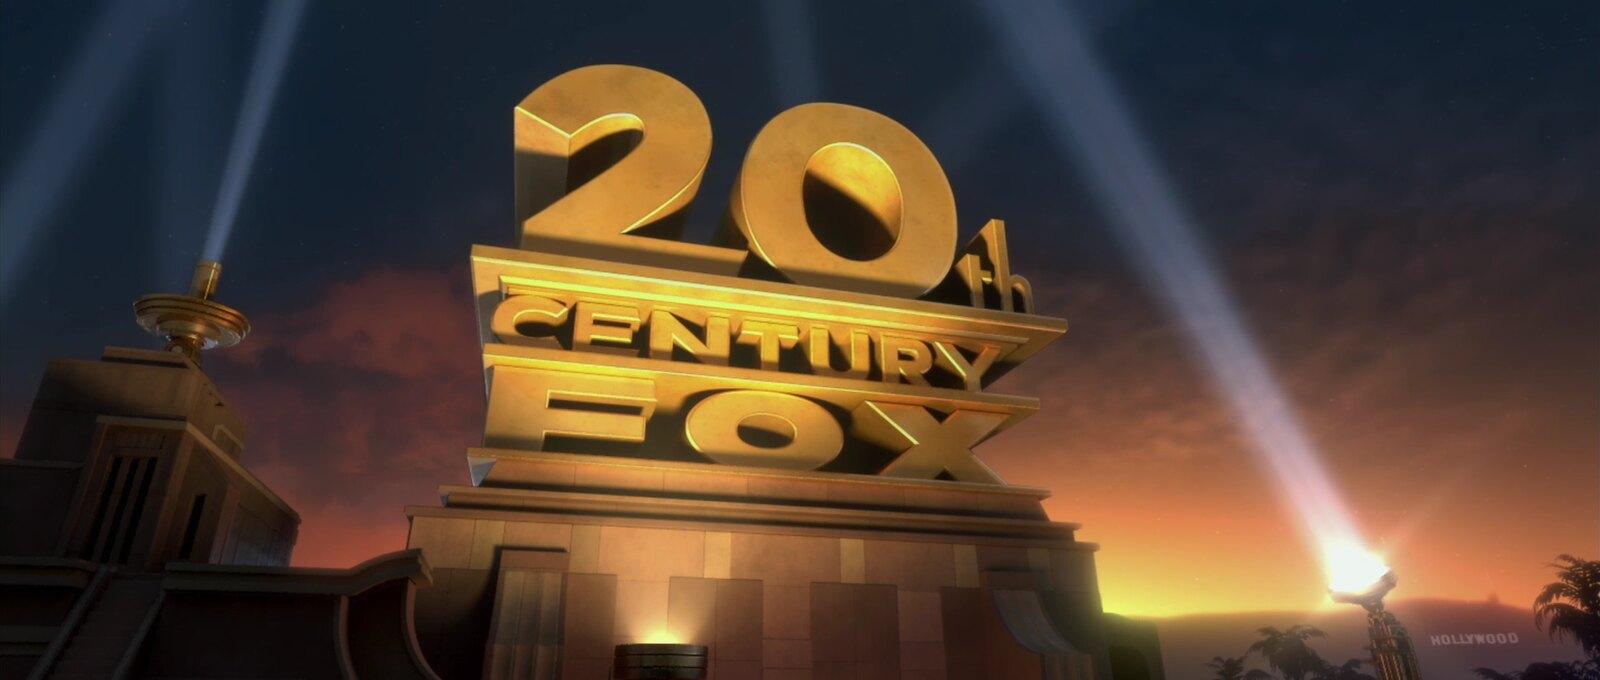 20th Century Fox Slideshow | Flickr